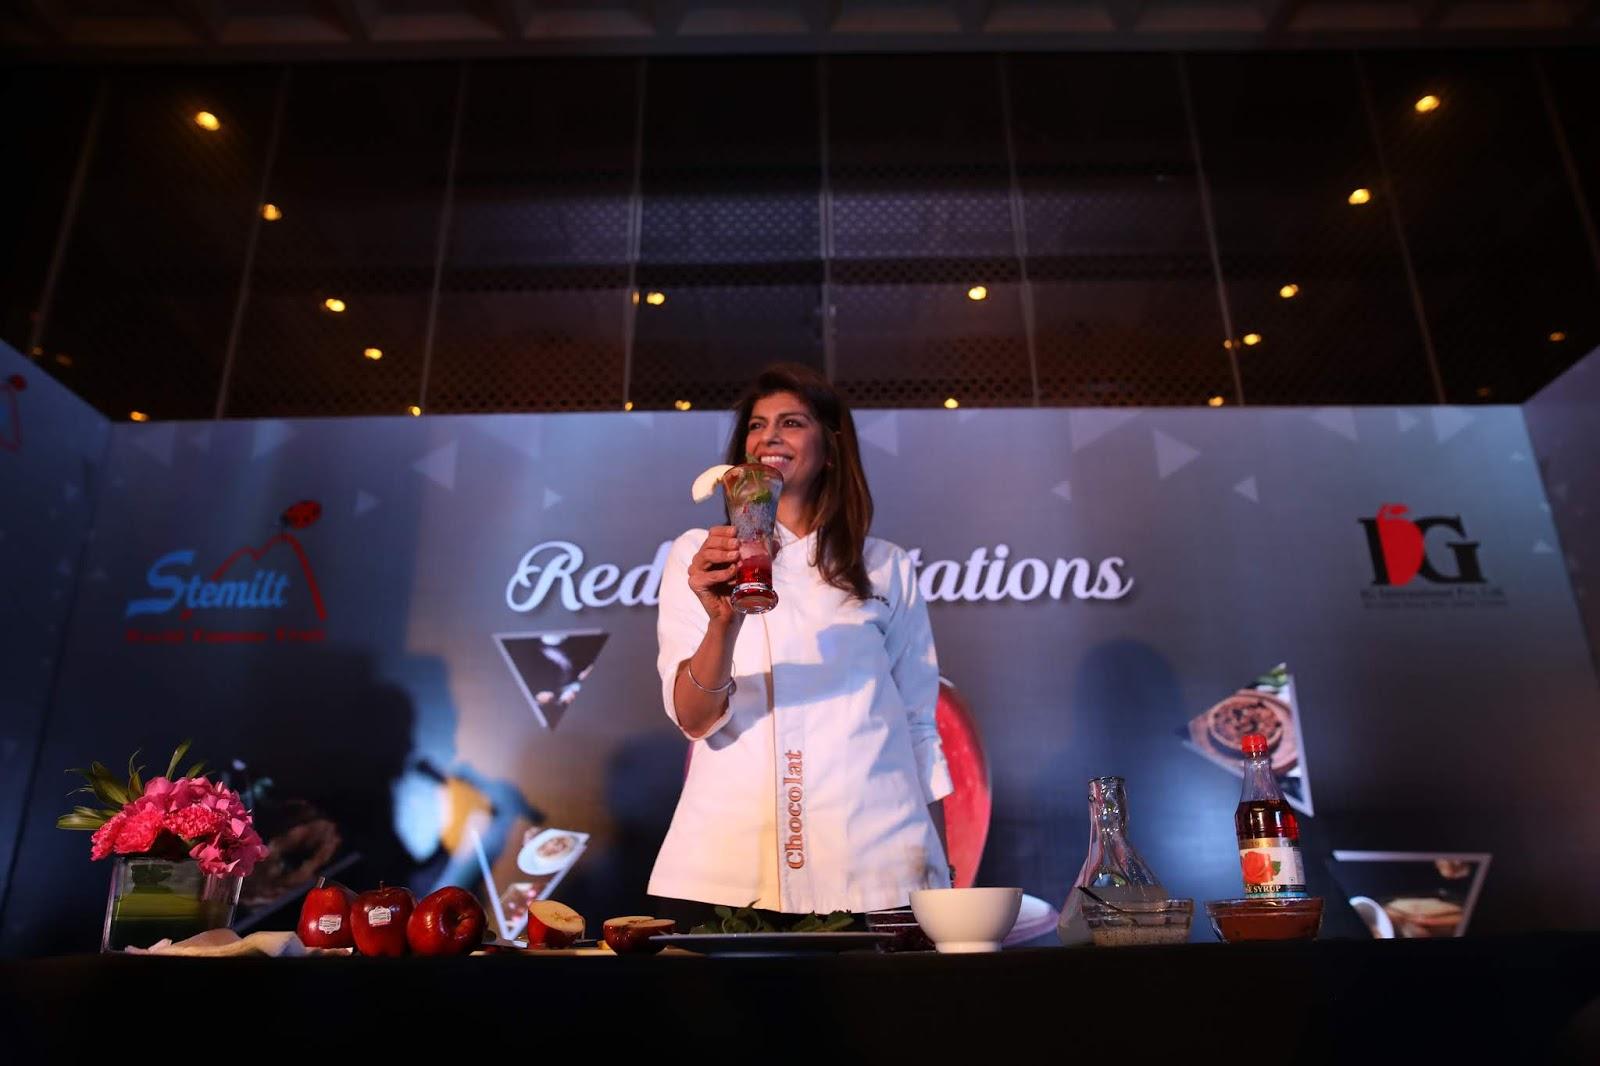 SPIRIT OF MUMBAI: IG International announced launch of